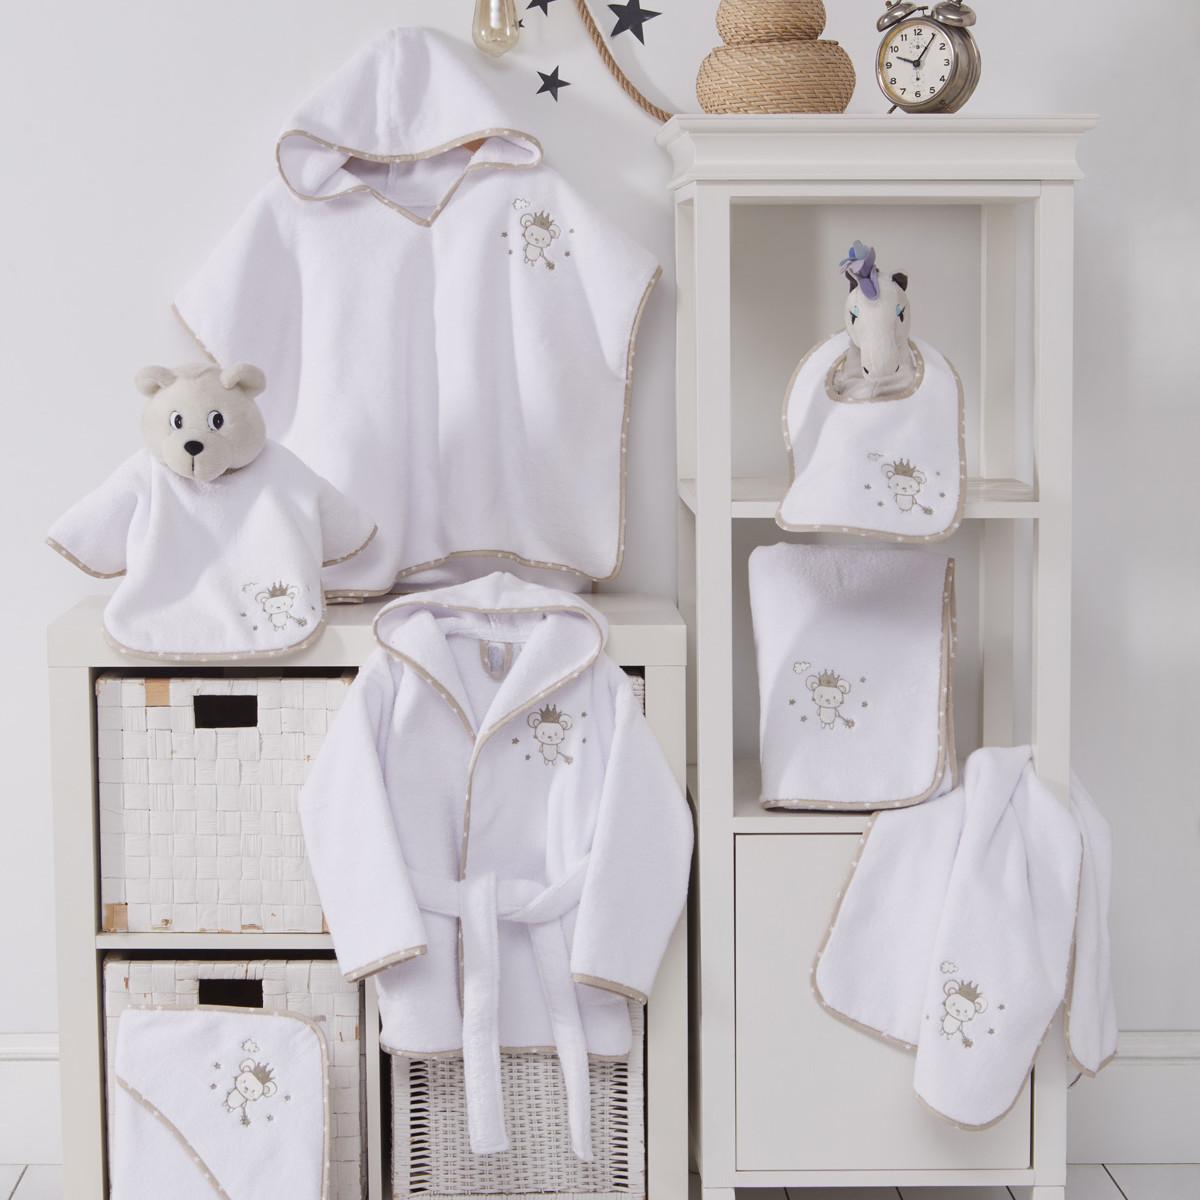 Drap de bain en coton peigné  Blanc 70x130 cm